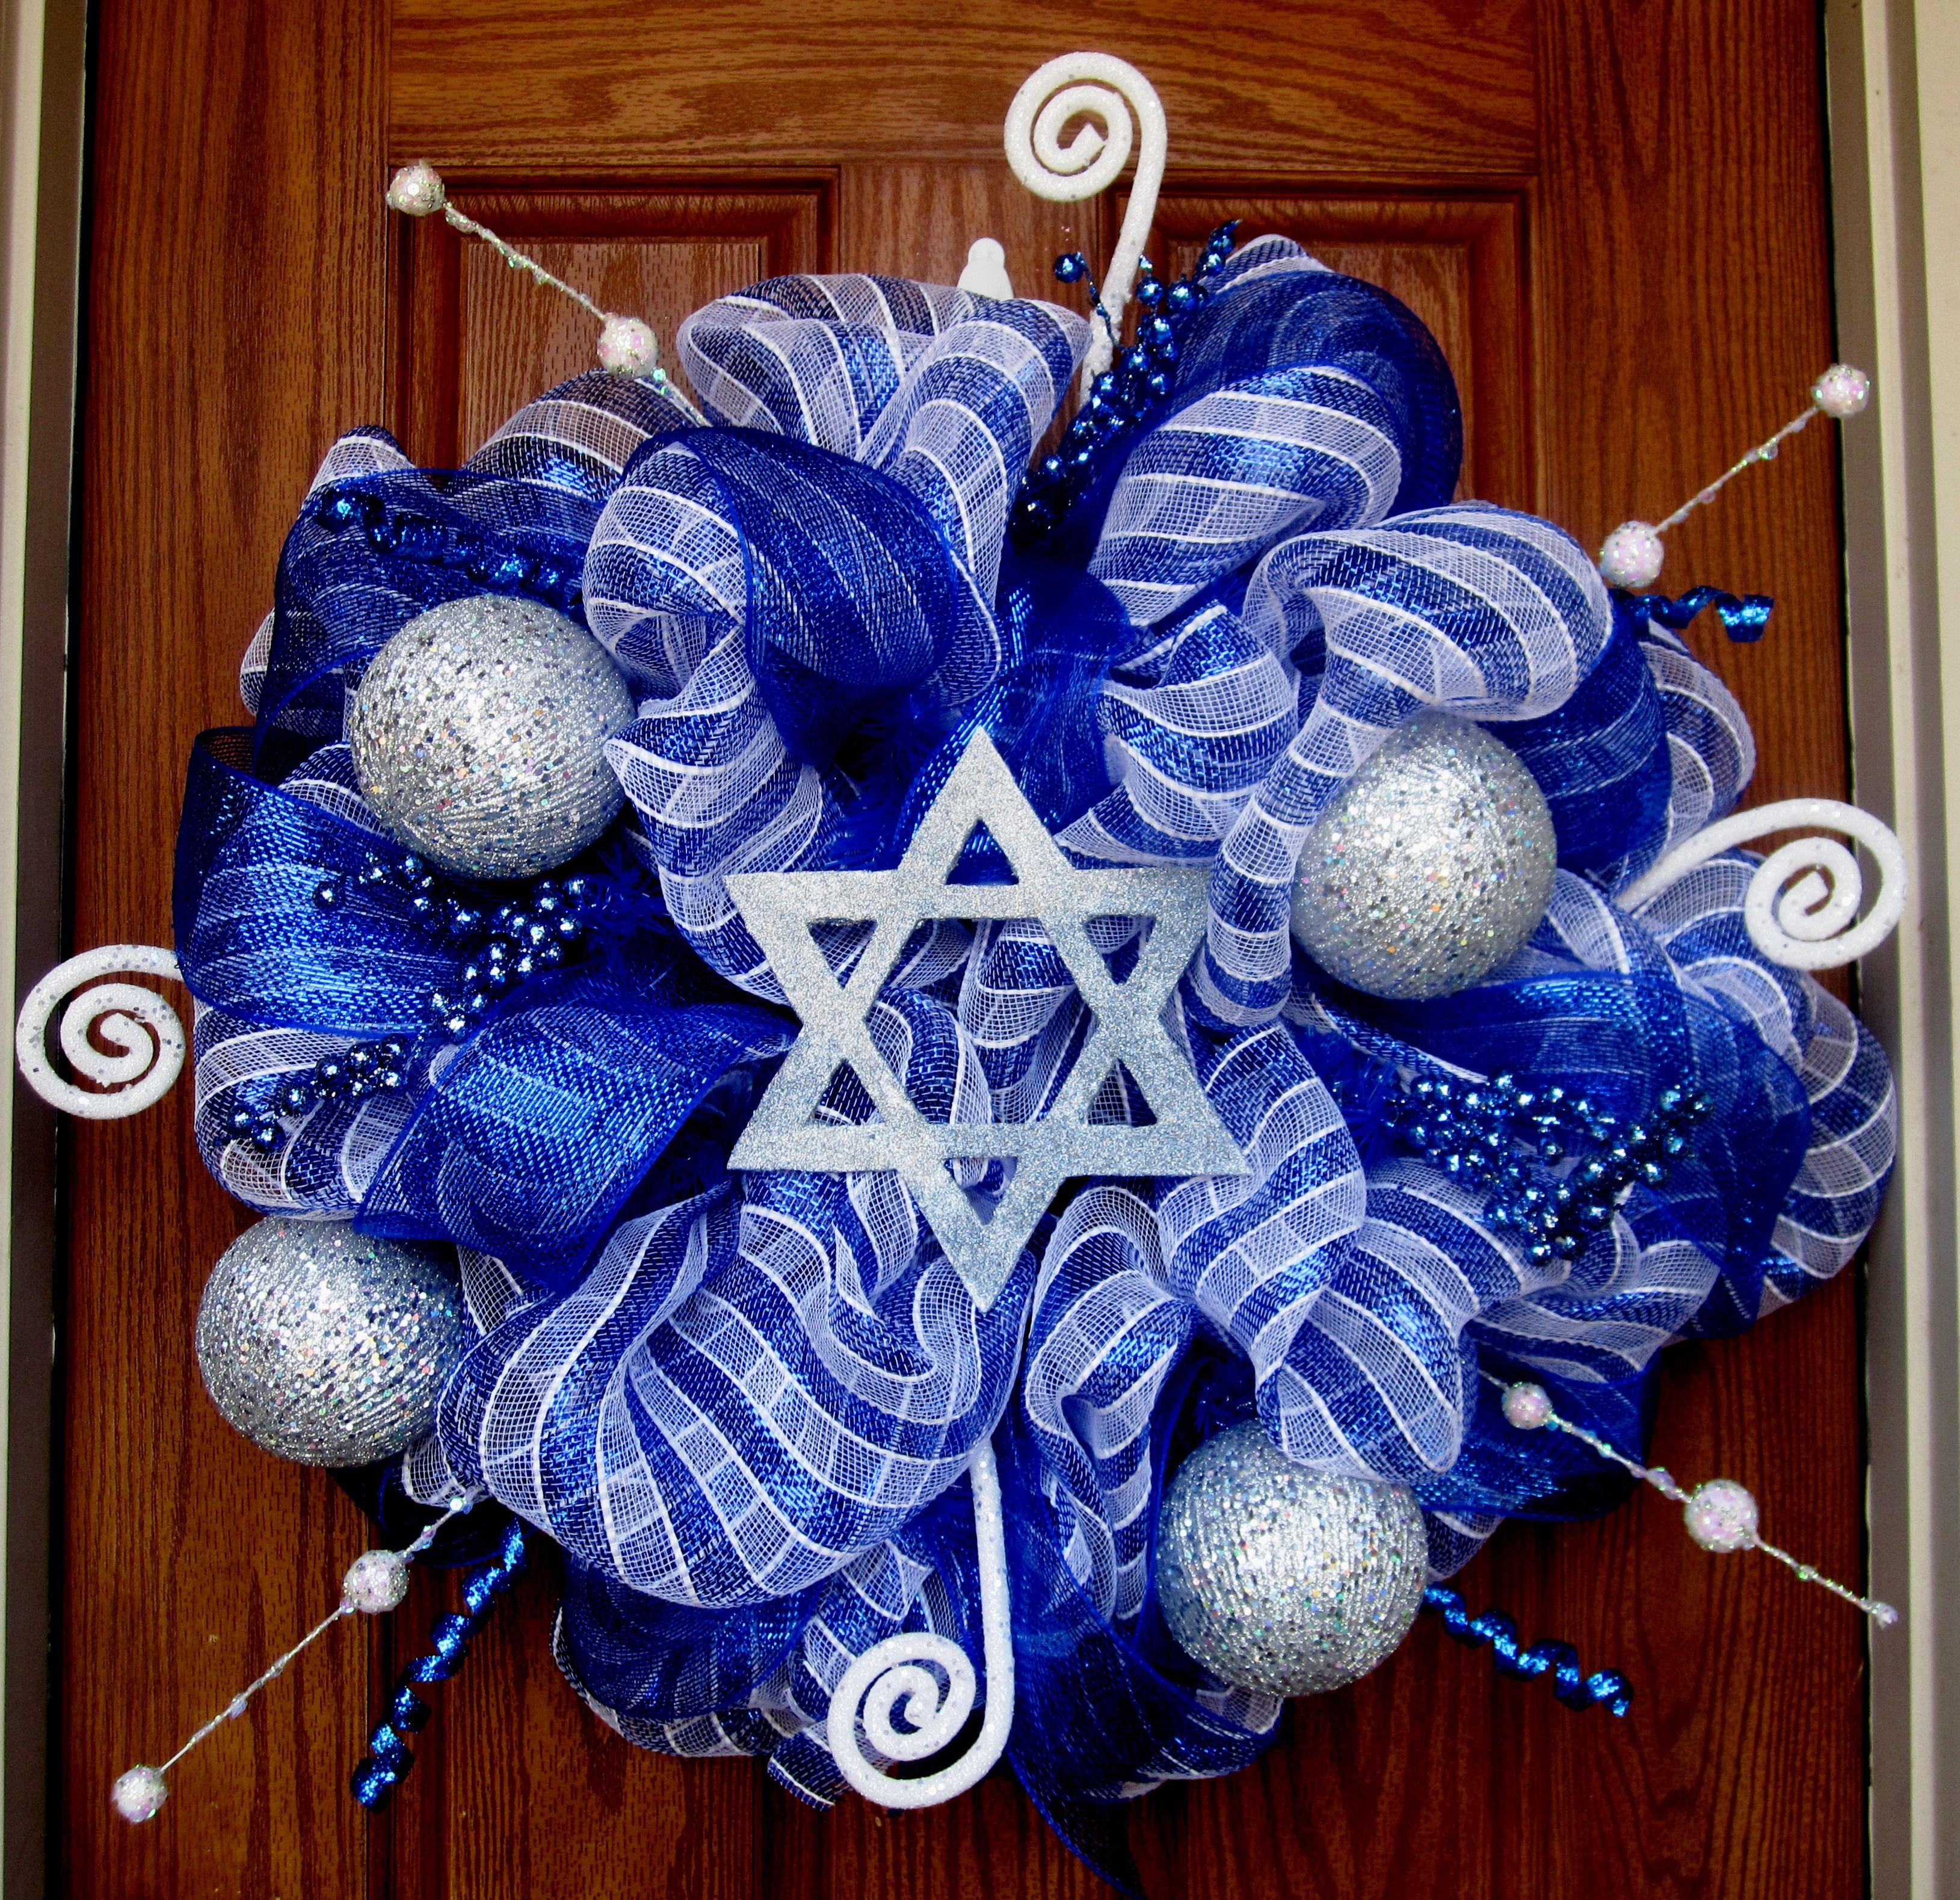 Hanukkah Wreath With Star Of David